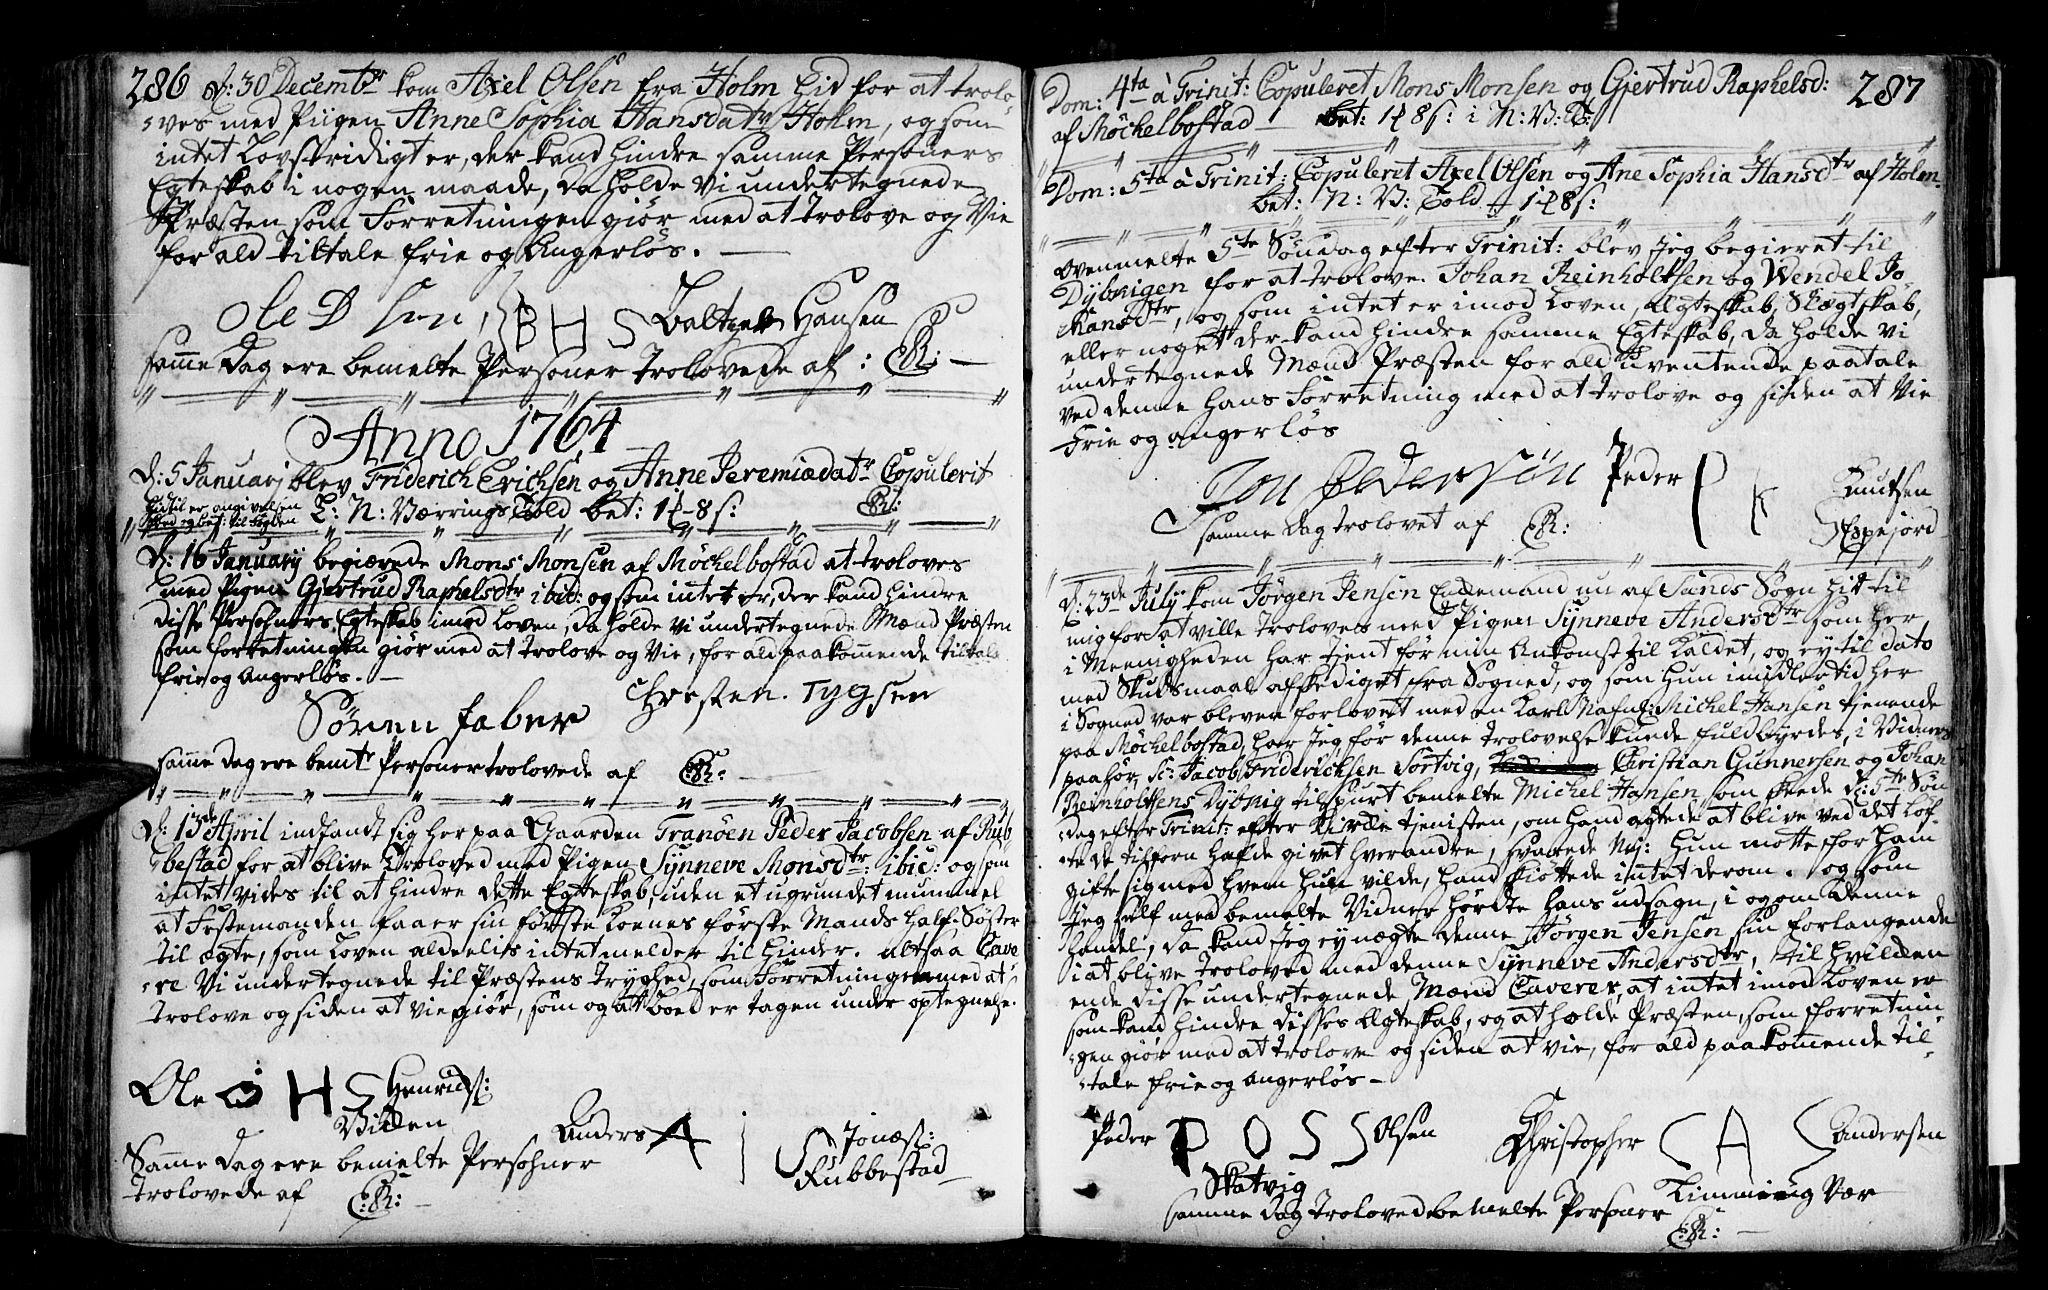 SATØ, Tranøy sokneprestkontor, I/Ia/Iaa/L0001kirke: Ministerialbok nr. 1, 1757-1773, s. 286-287